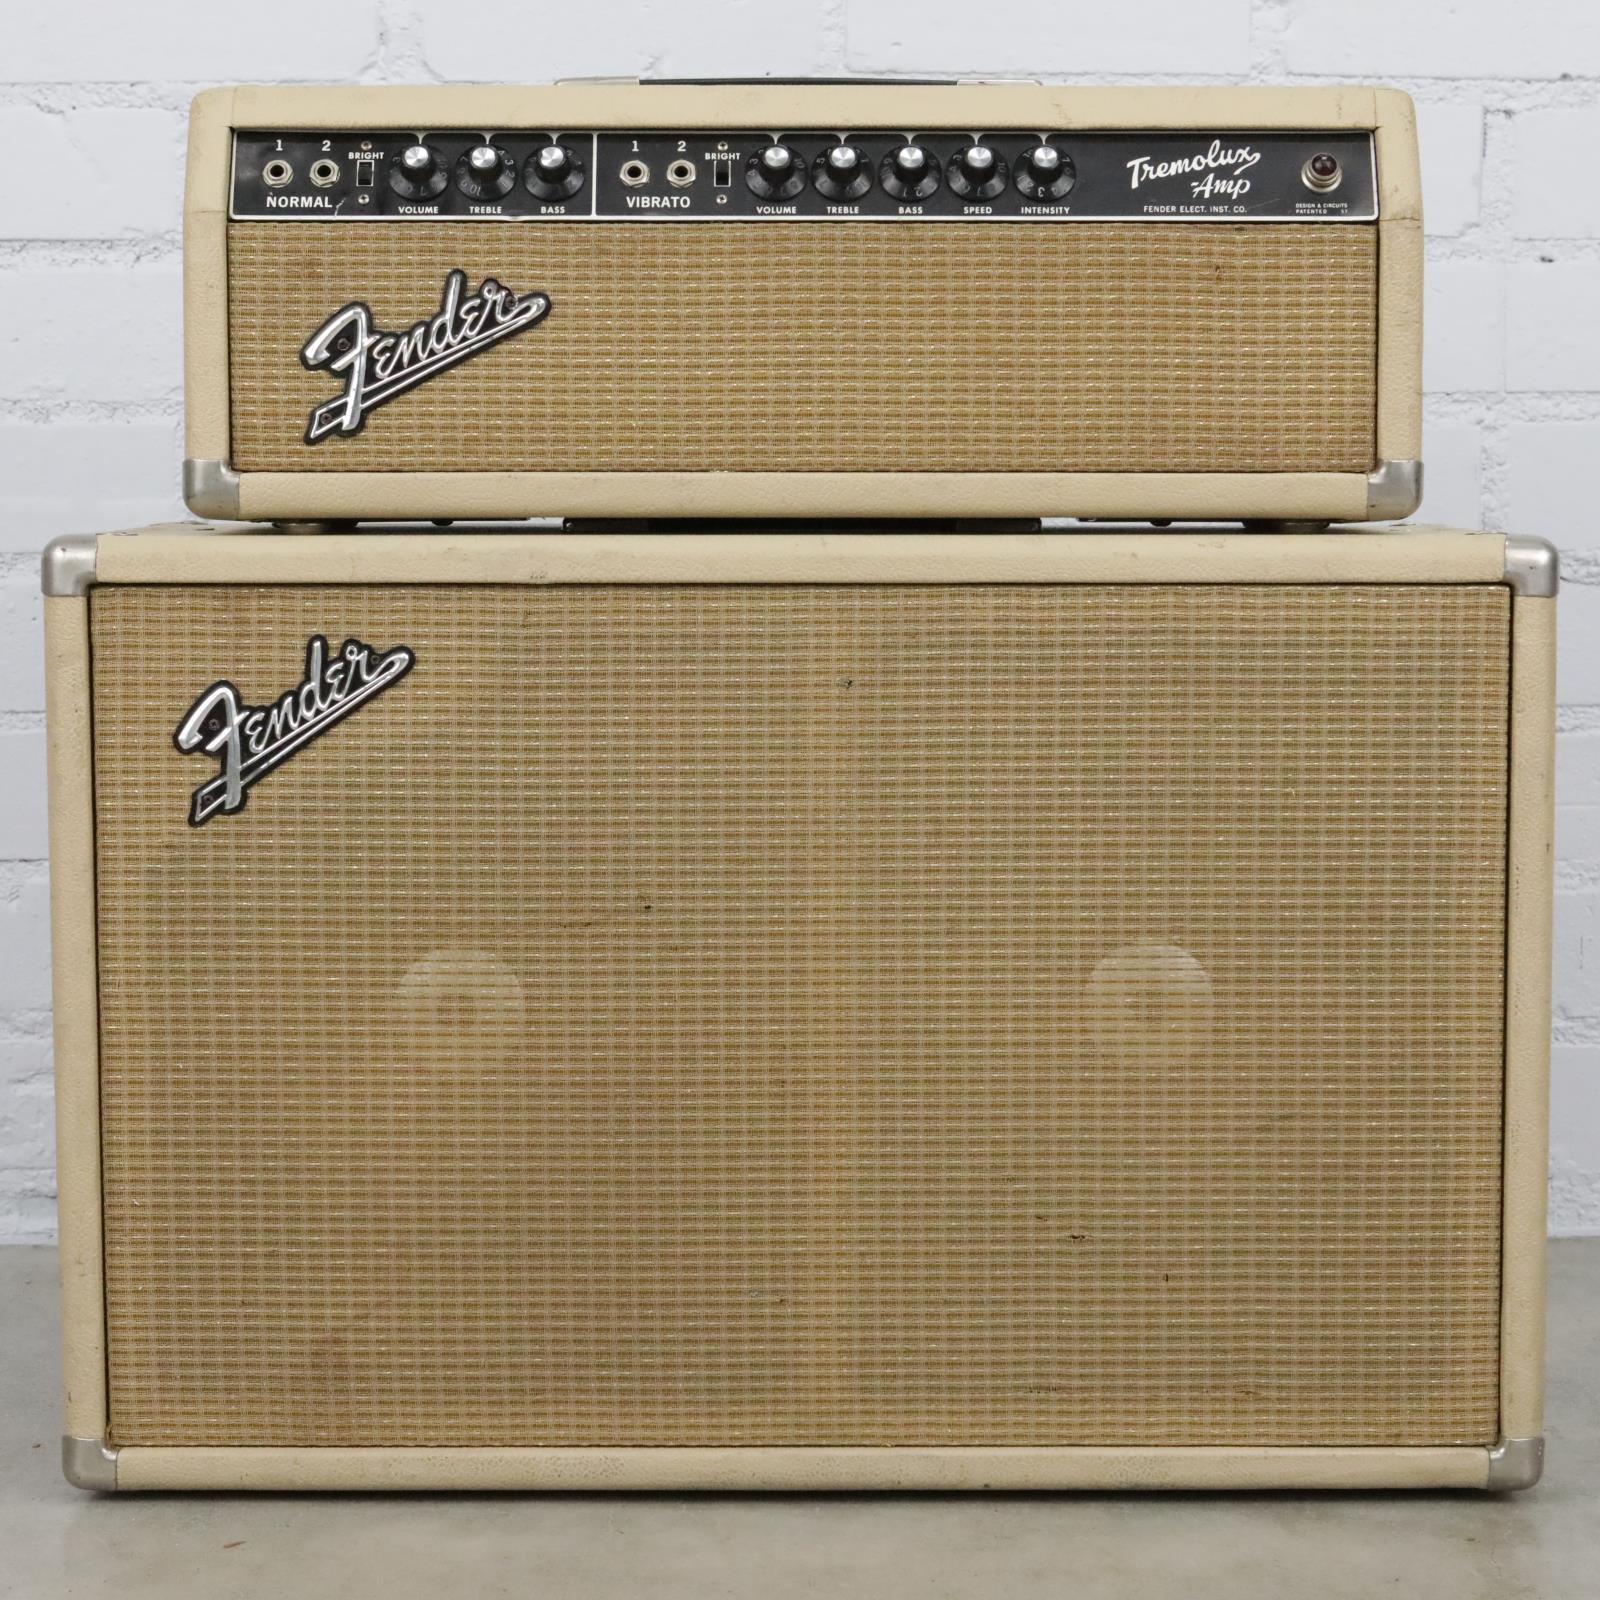 1964 Fender Tremolux AA763 Tube Amp Head & 2x10 Cab Cabinet Blonde #40489